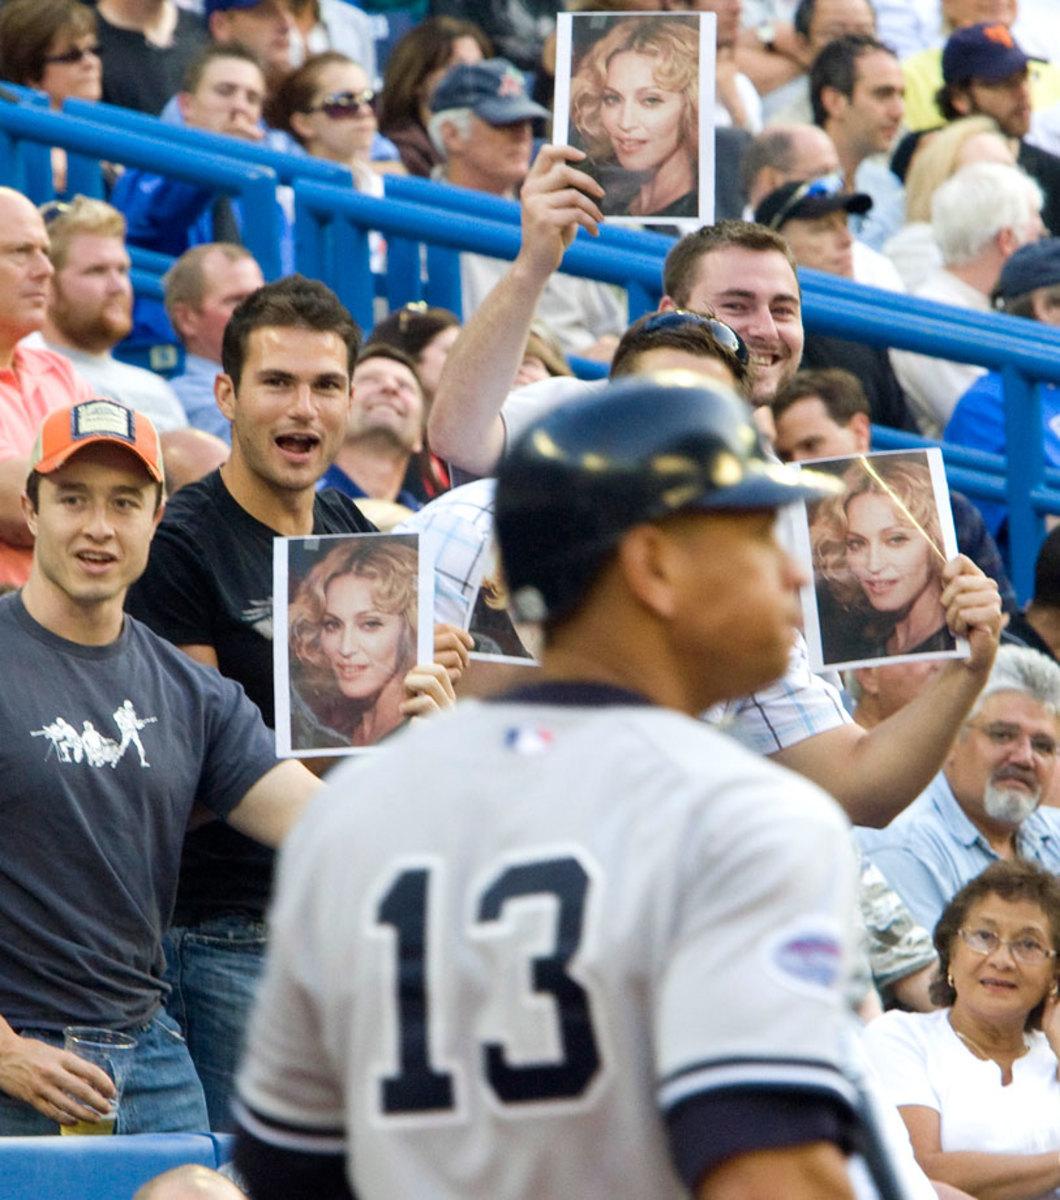 2008-Alex-Rodriguez-fans-Madonna-signs.jpg